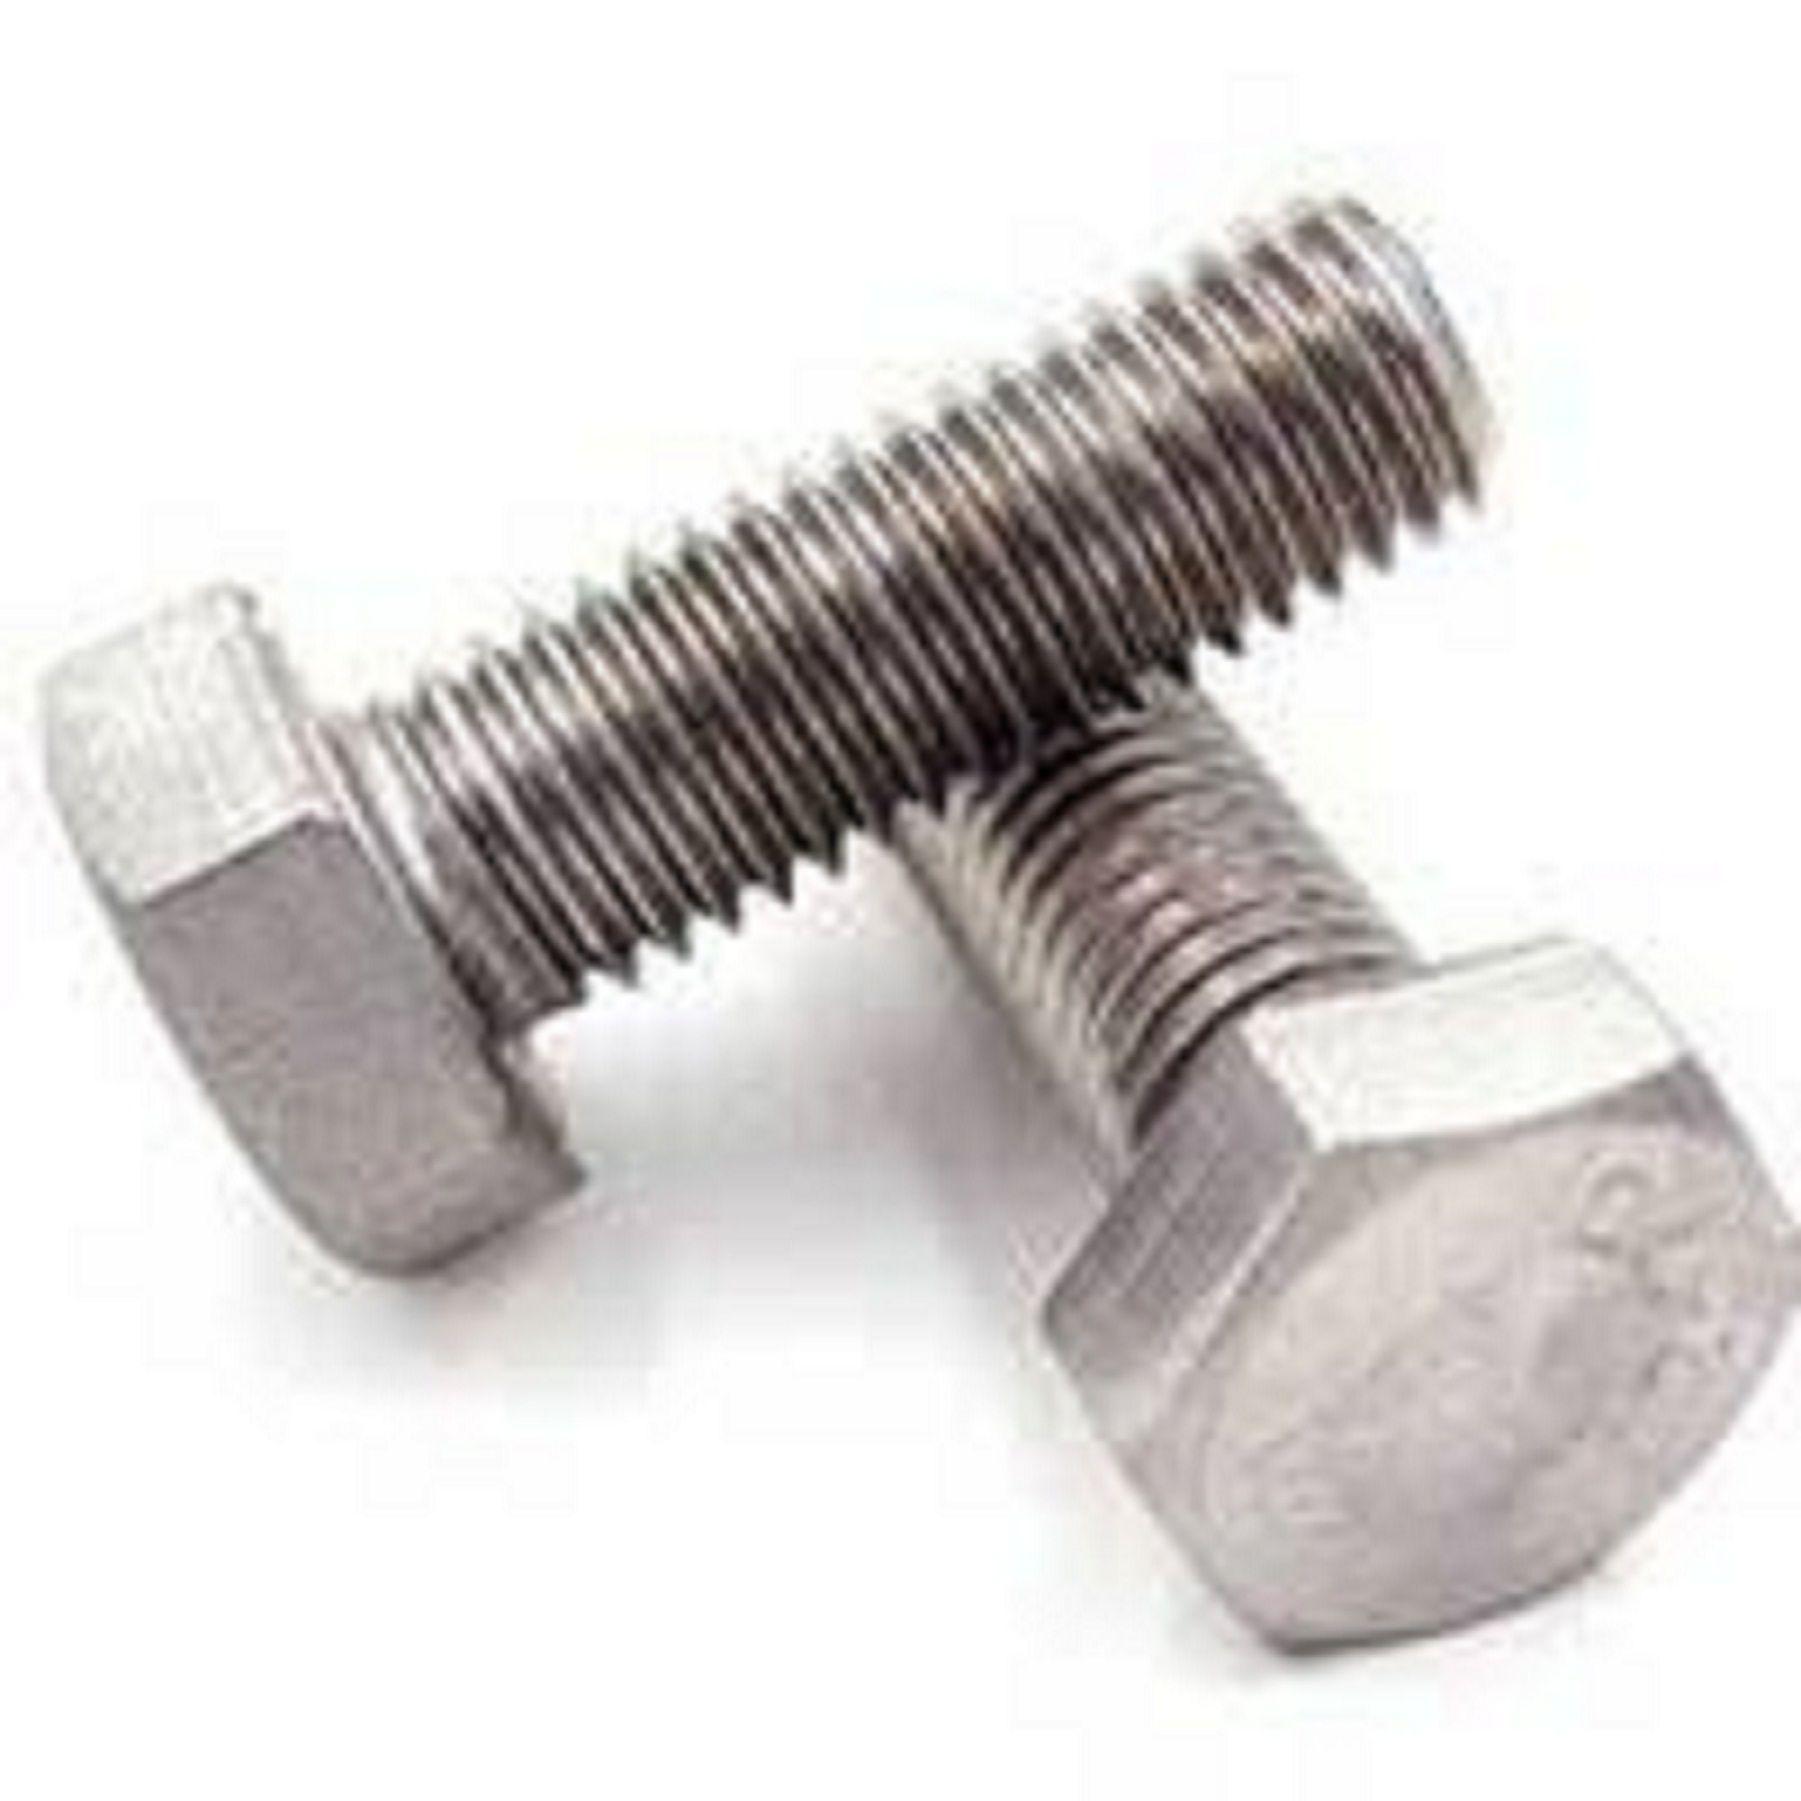 Nut Bolt Screw Washer Bolt Steel Manufacturing